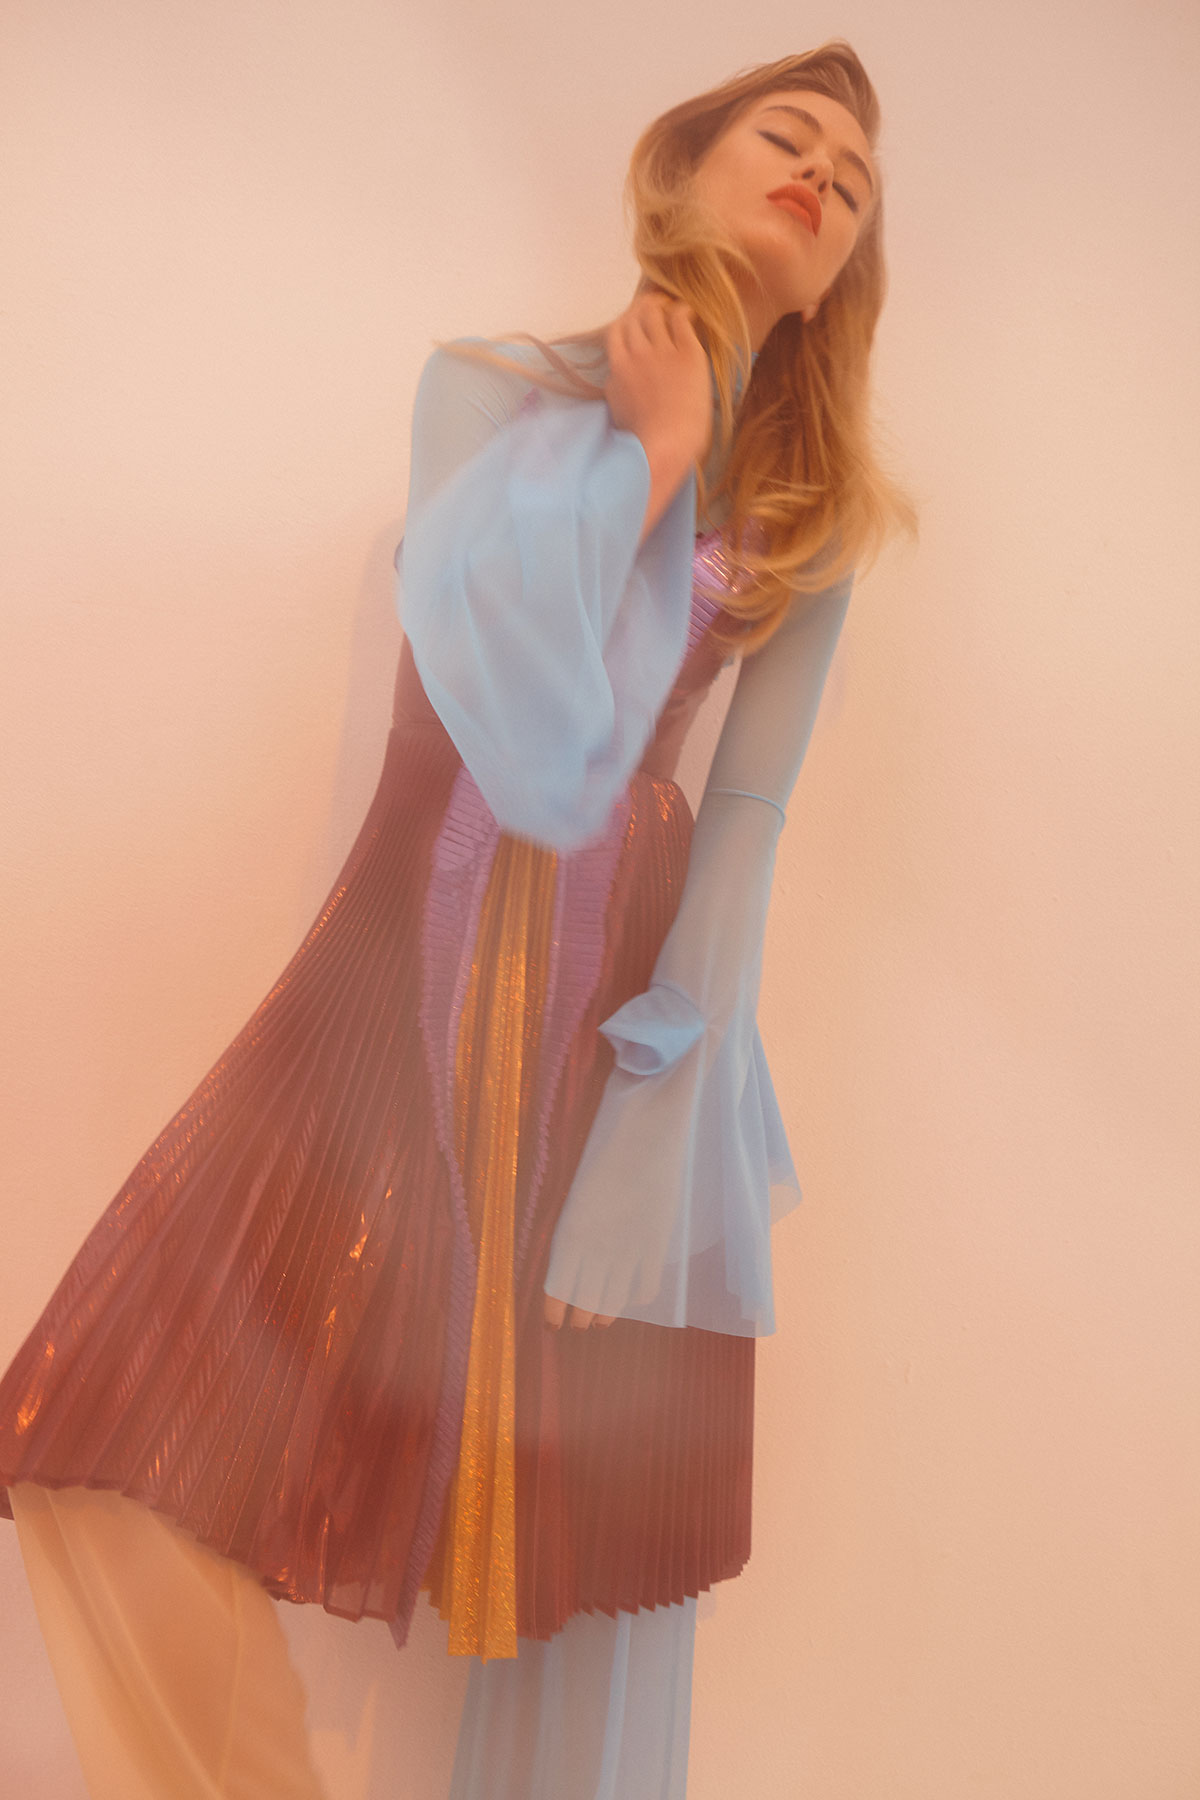 Teresa_Horstmann_Beautiful_Blood_Magazine_03